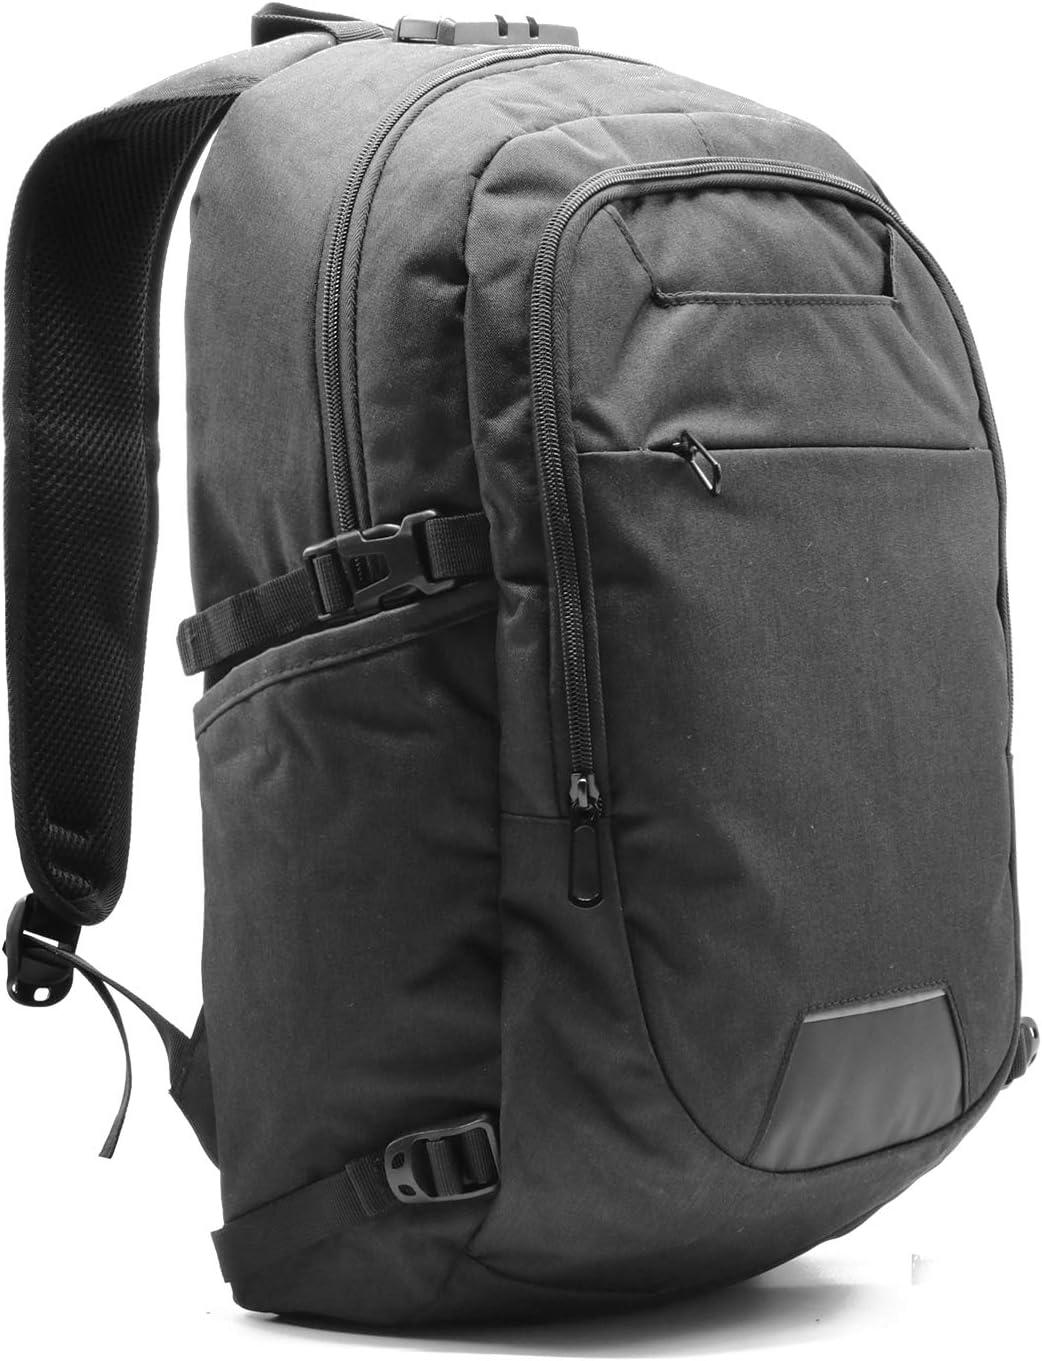 Business Waterproof Travel Laptop Backpack – USB Charging Port Computer Bag for Men and Women, Slim Water Resistant University, School Book Bag Fits Below 21 in Laptop Notebook Black Color